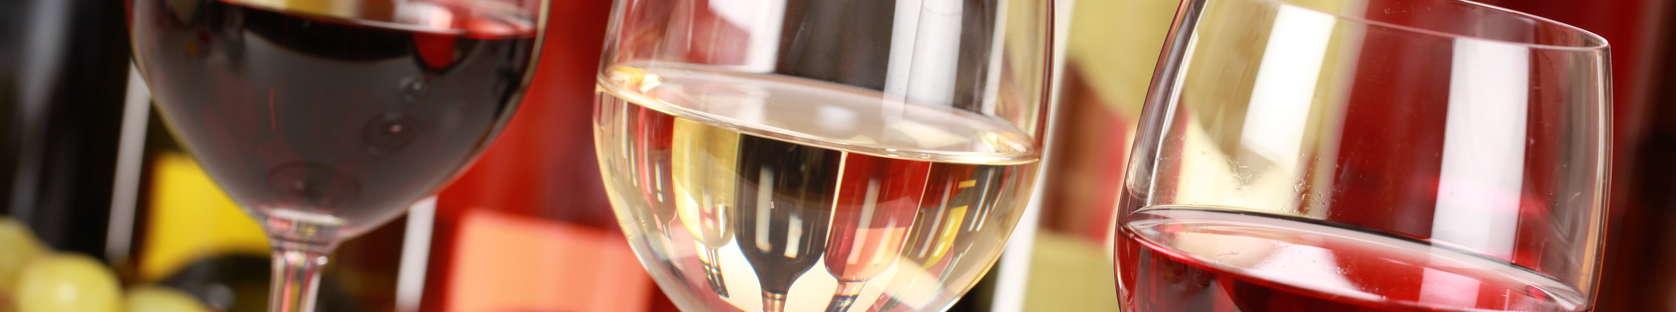 Хитрости домашнего вина